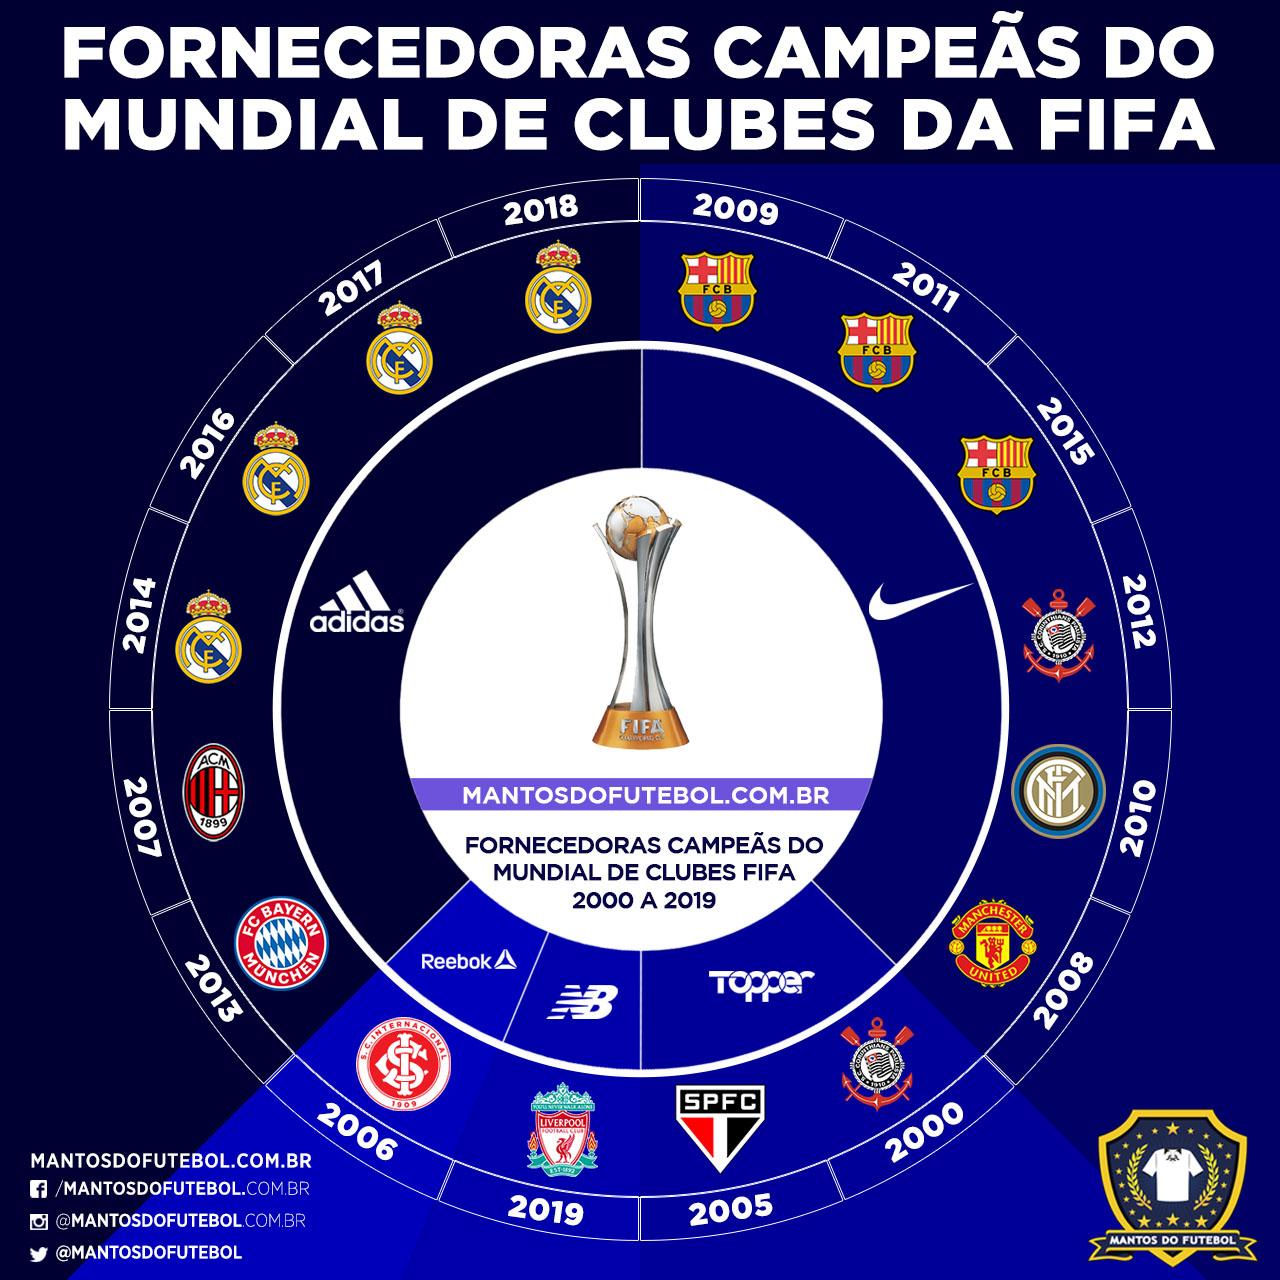 Fornecedoras campeãs mundial de clubes FIFA